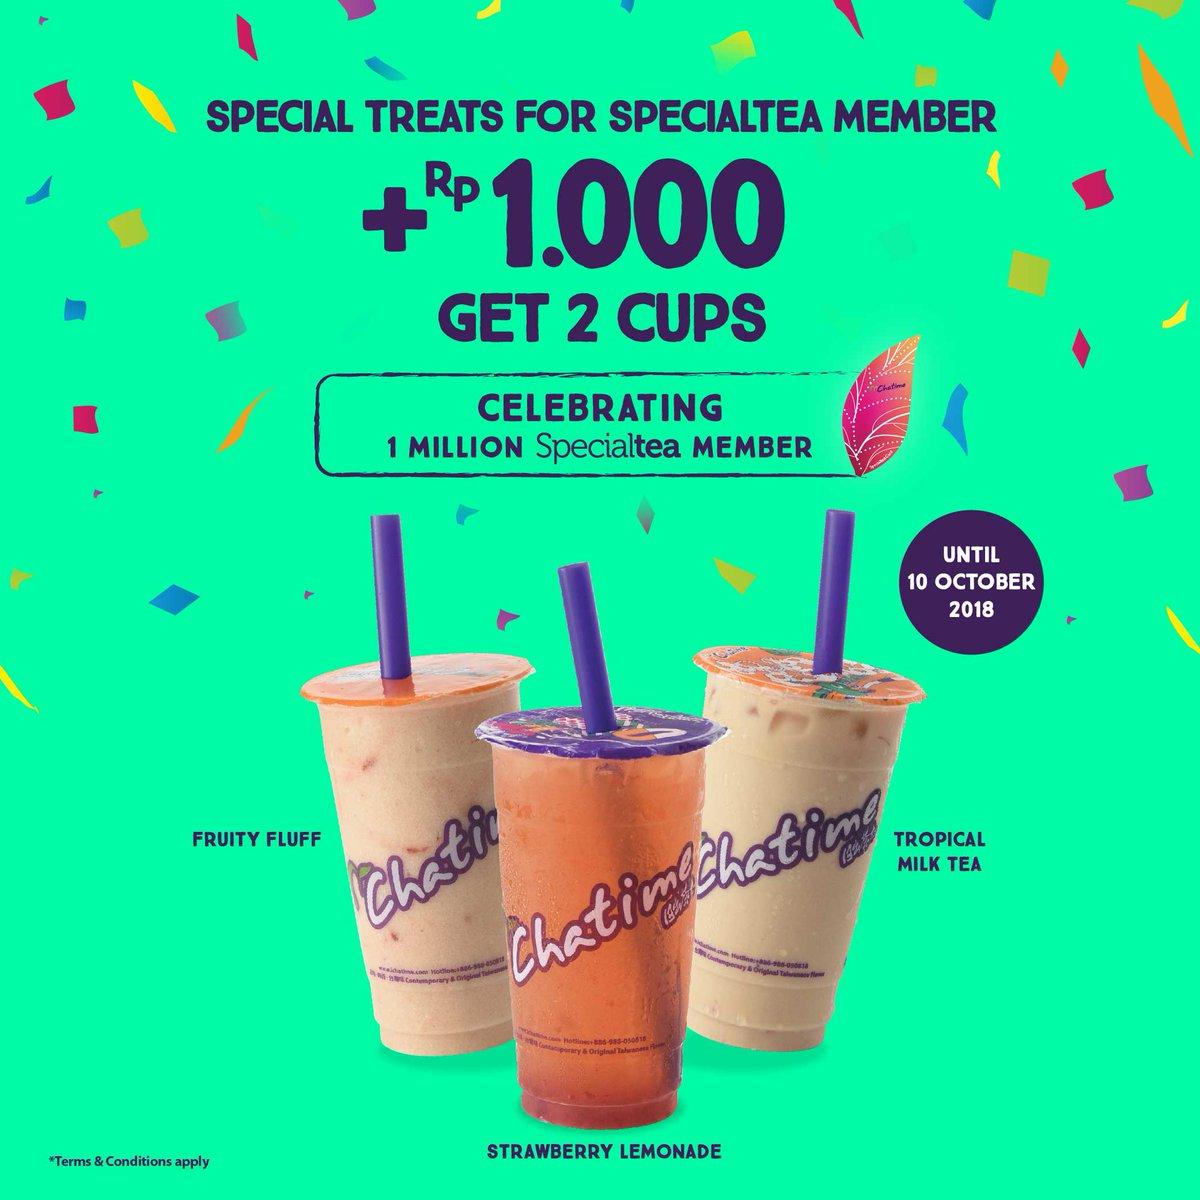 Chatime - Promo Special Tea Member Promo + 1000 Free Tropical Sensation